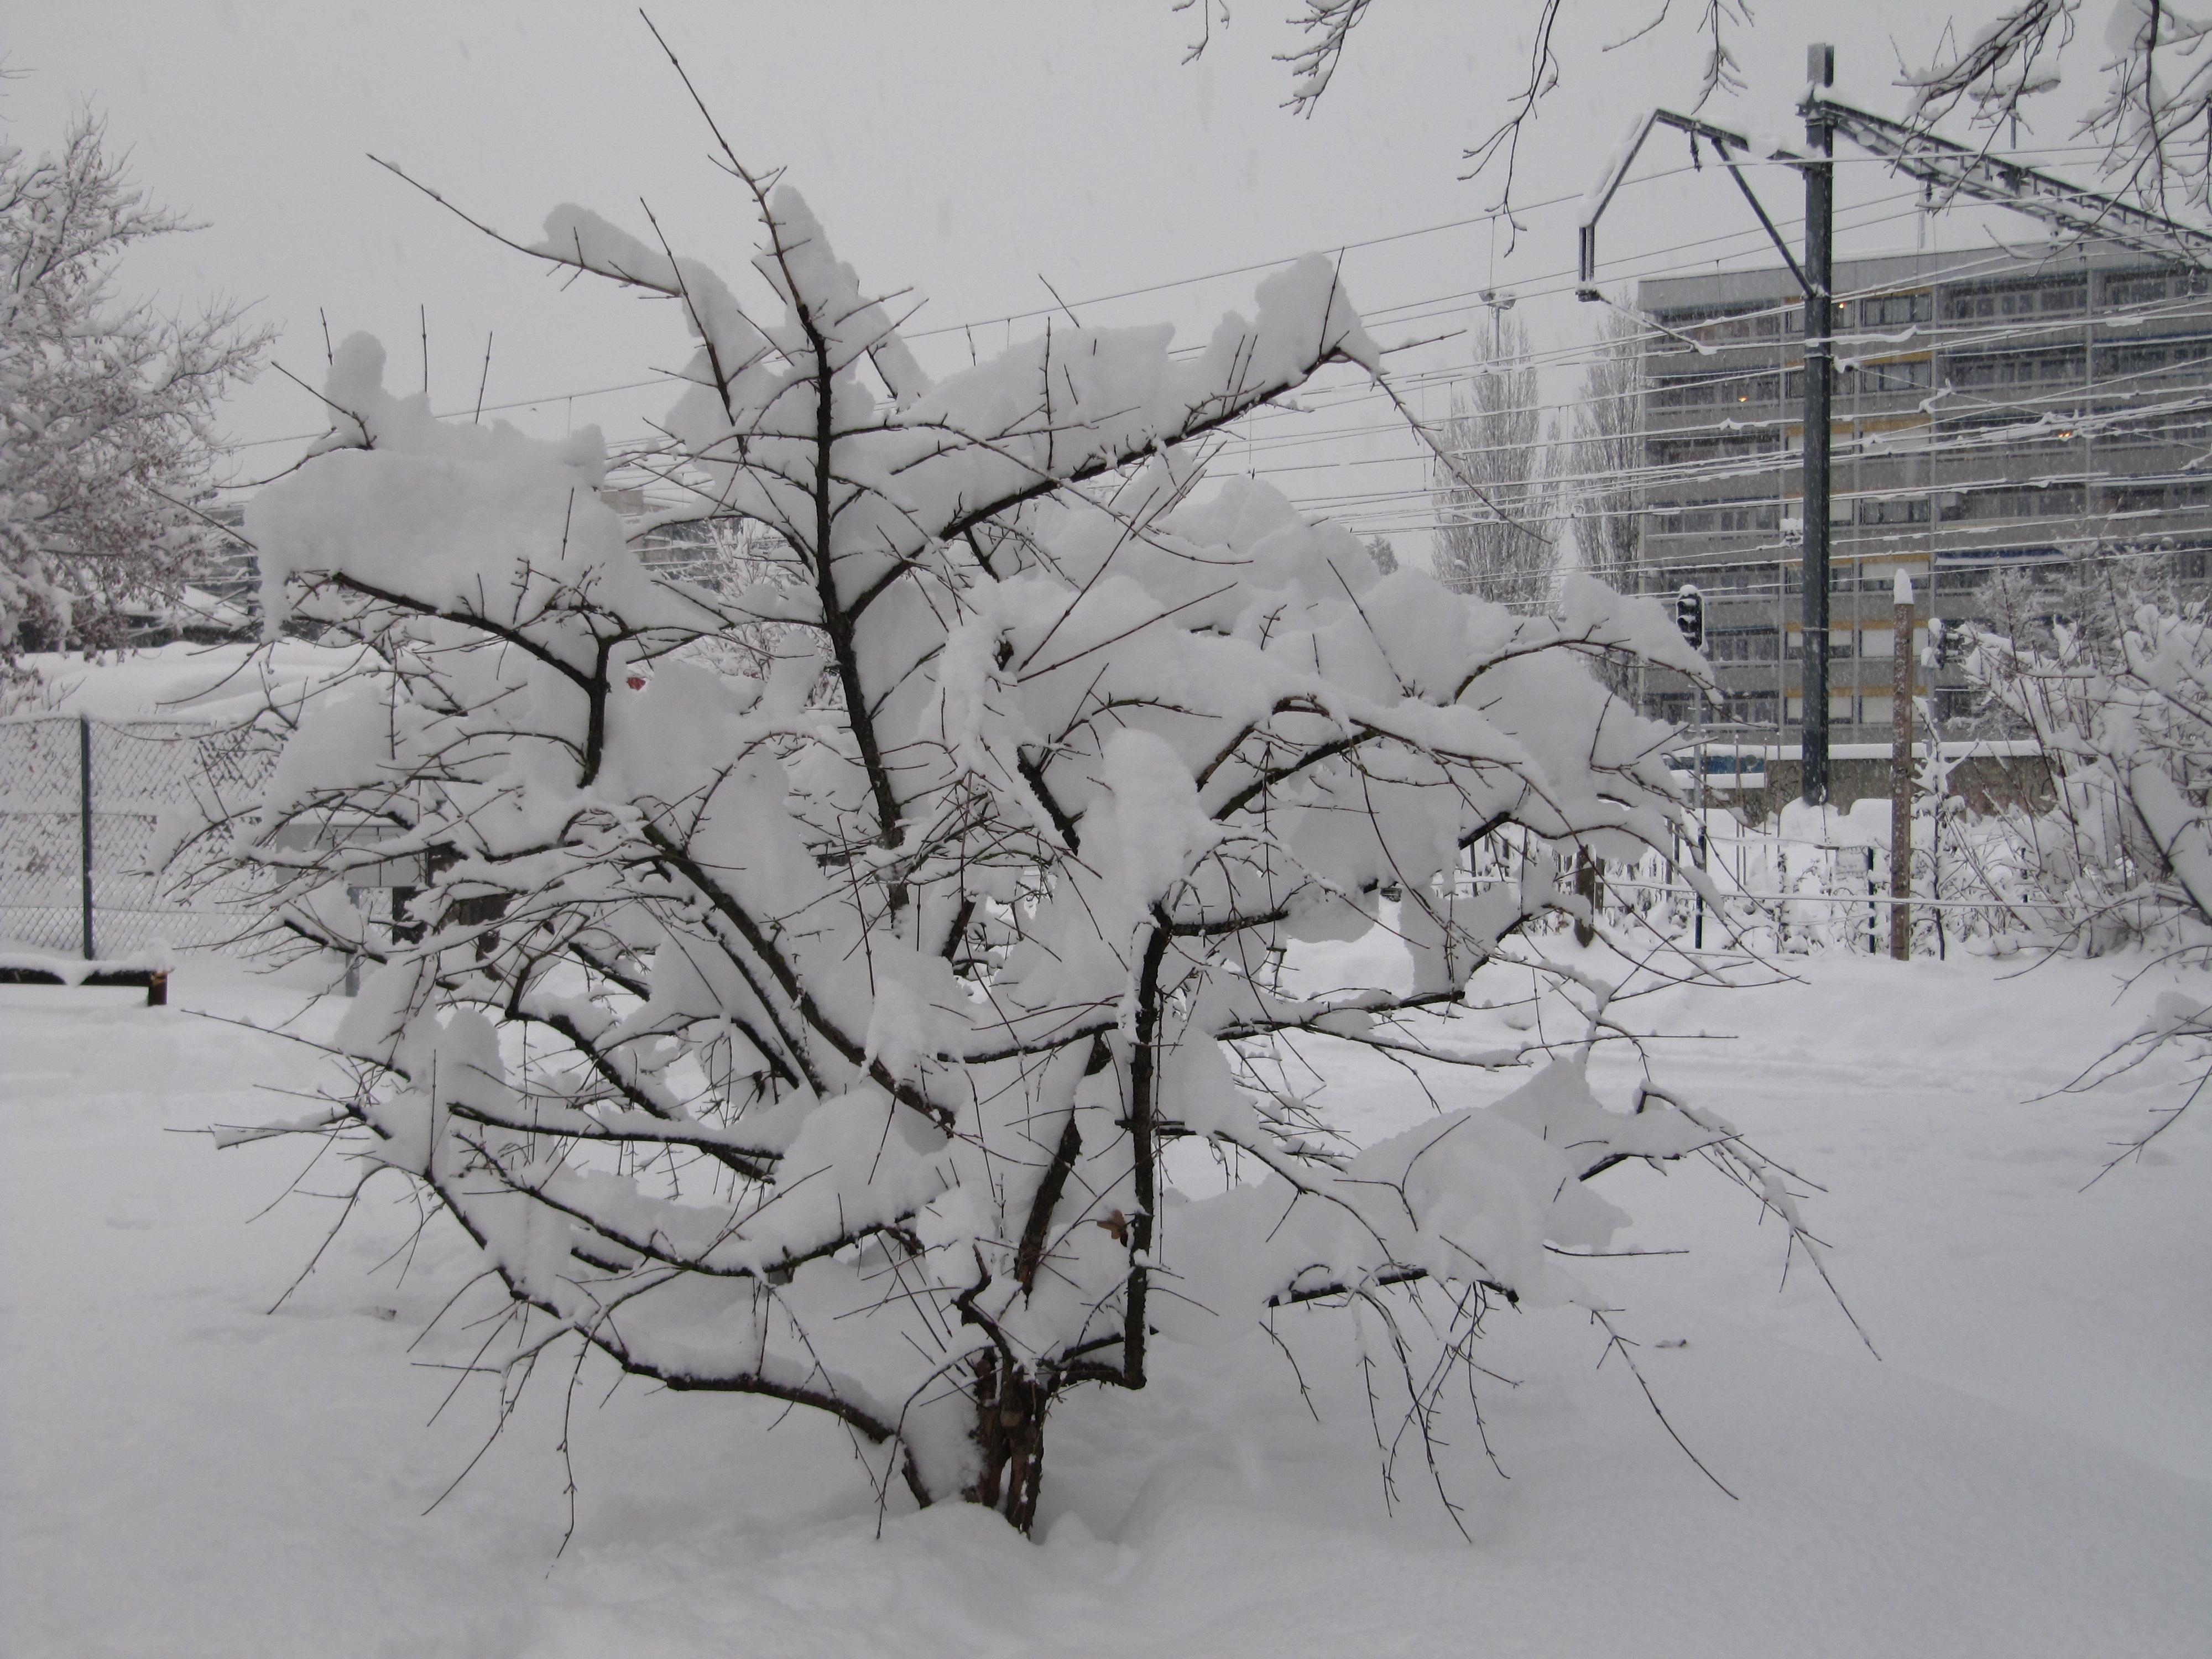 neige054.jpg